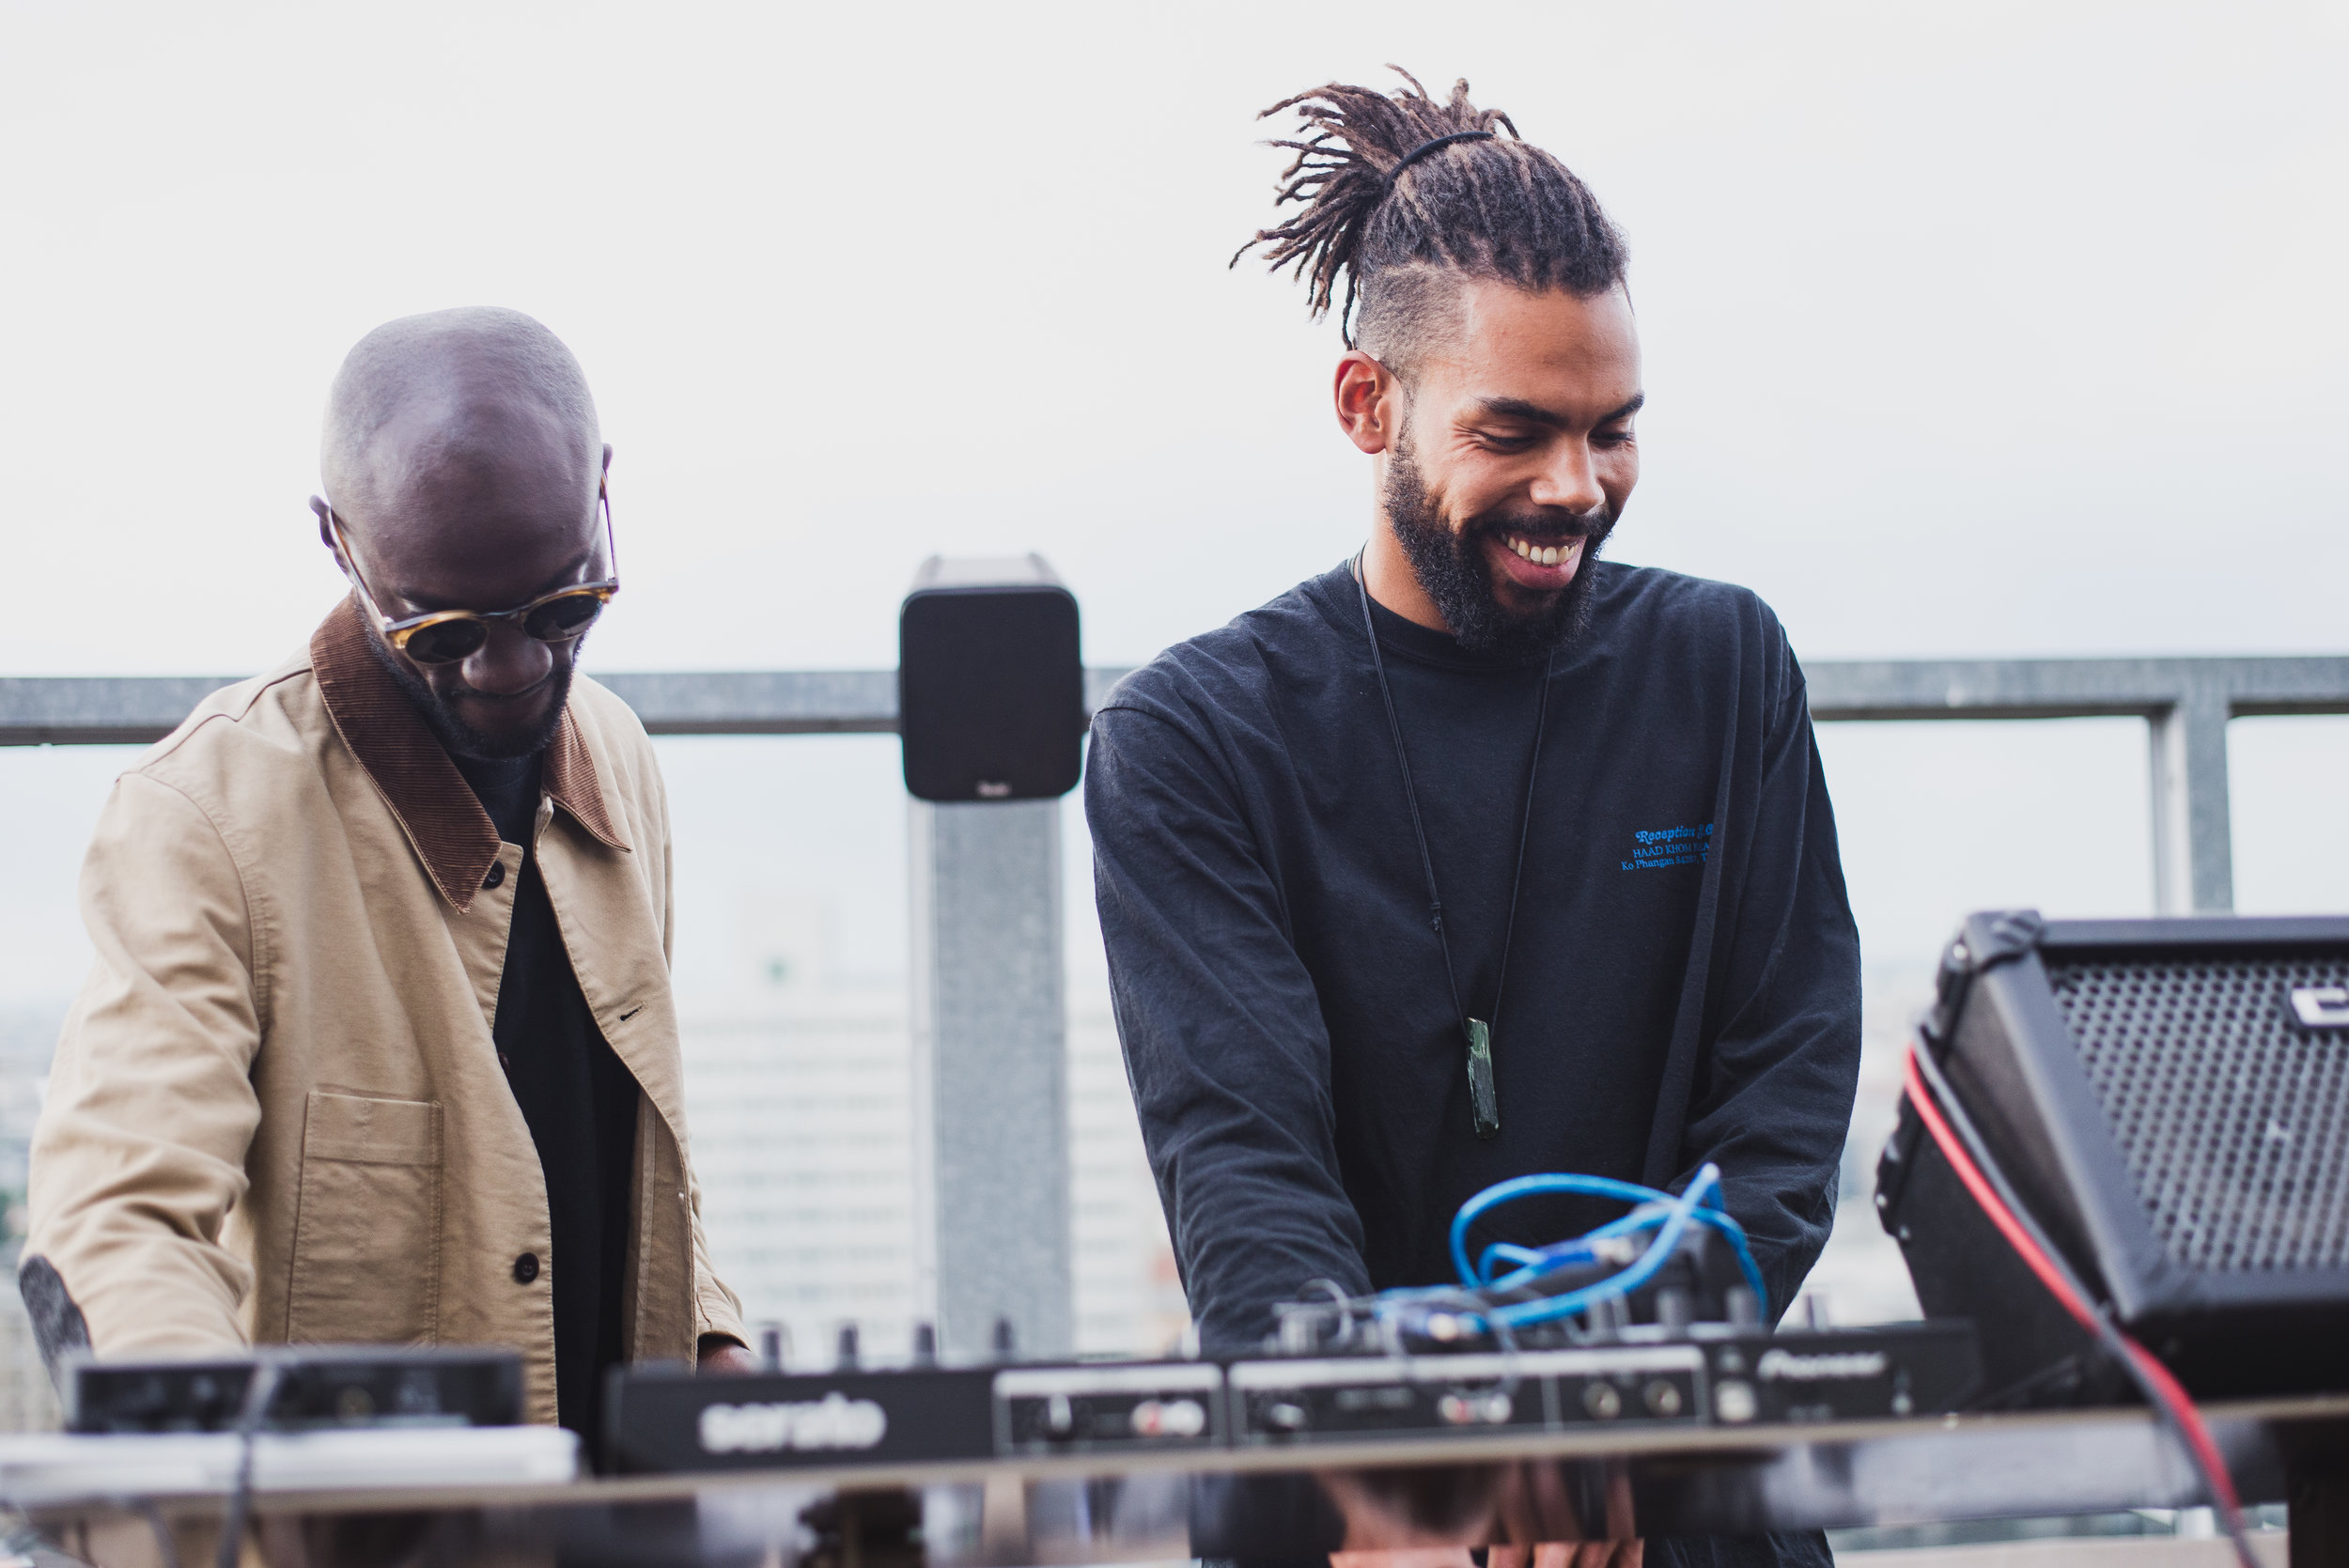 DJ Chix an den Turntables auf dem Rooftop vom Weekend Cub, (C) Daria Modin